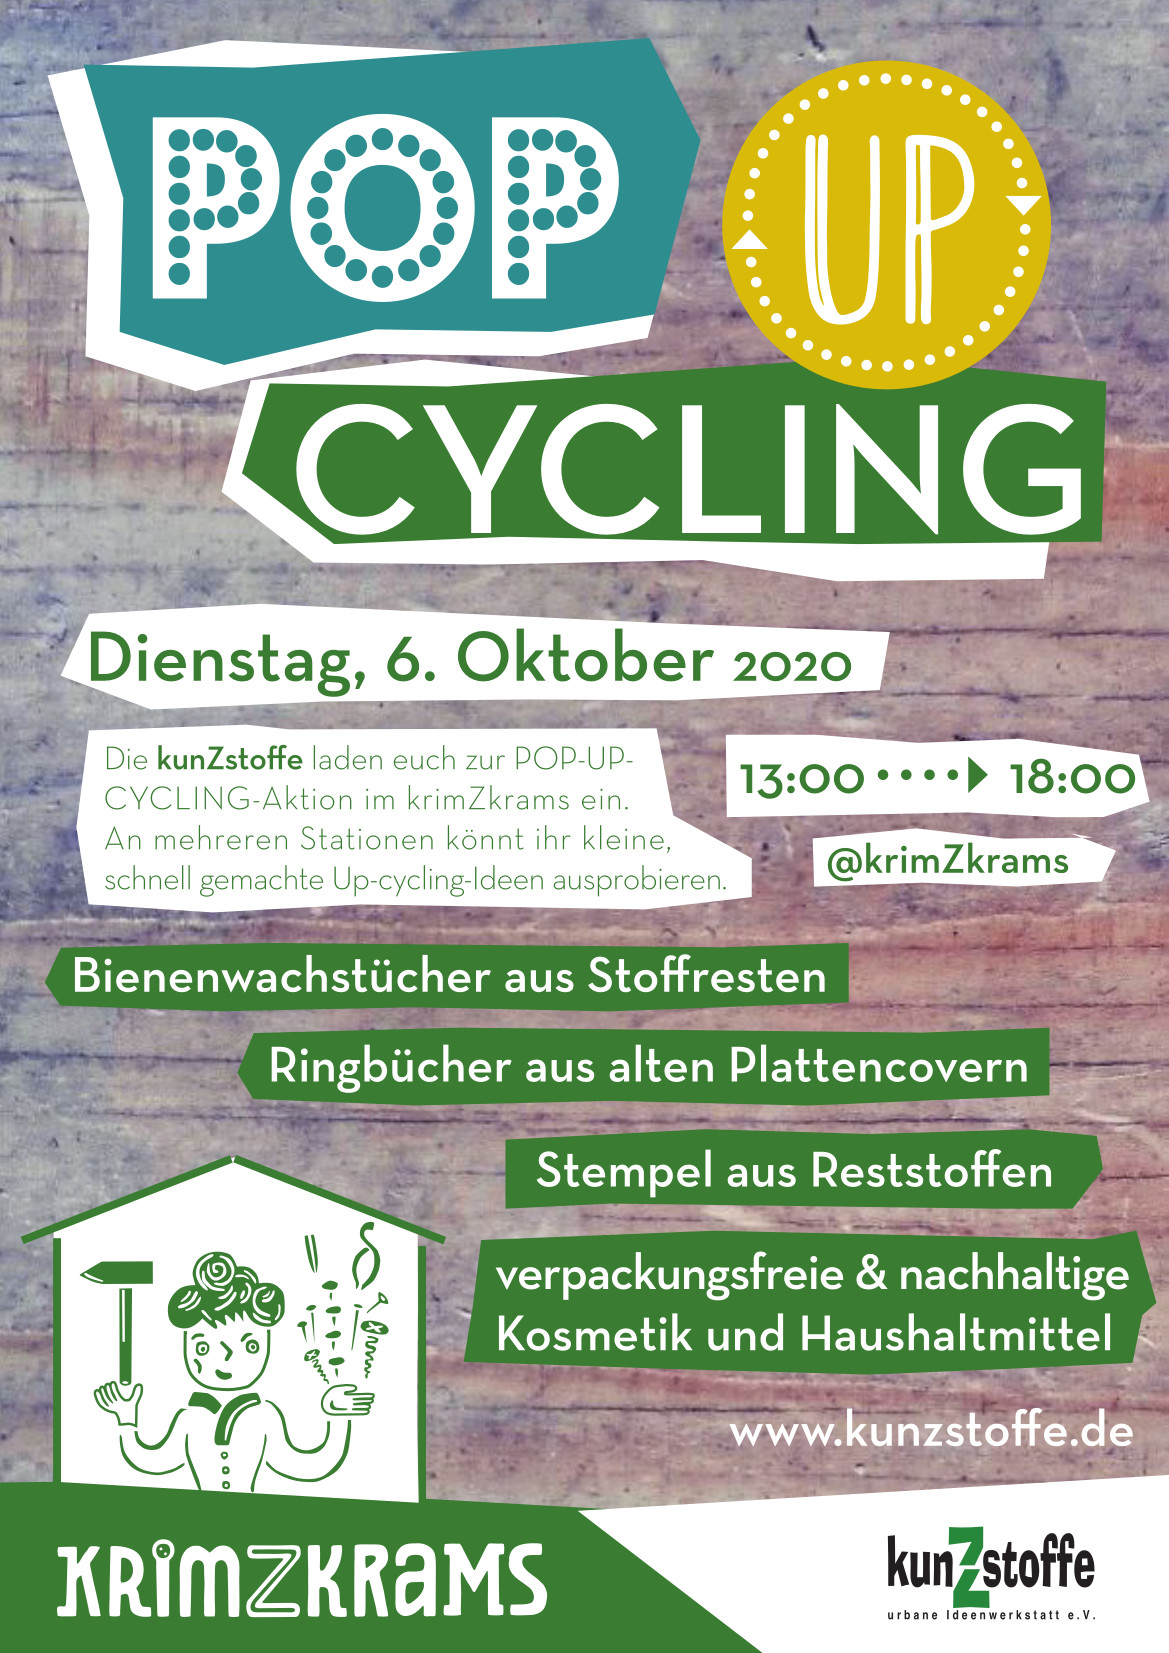 POP-UP-CYCLING im krimZkrams am 6.10.2020